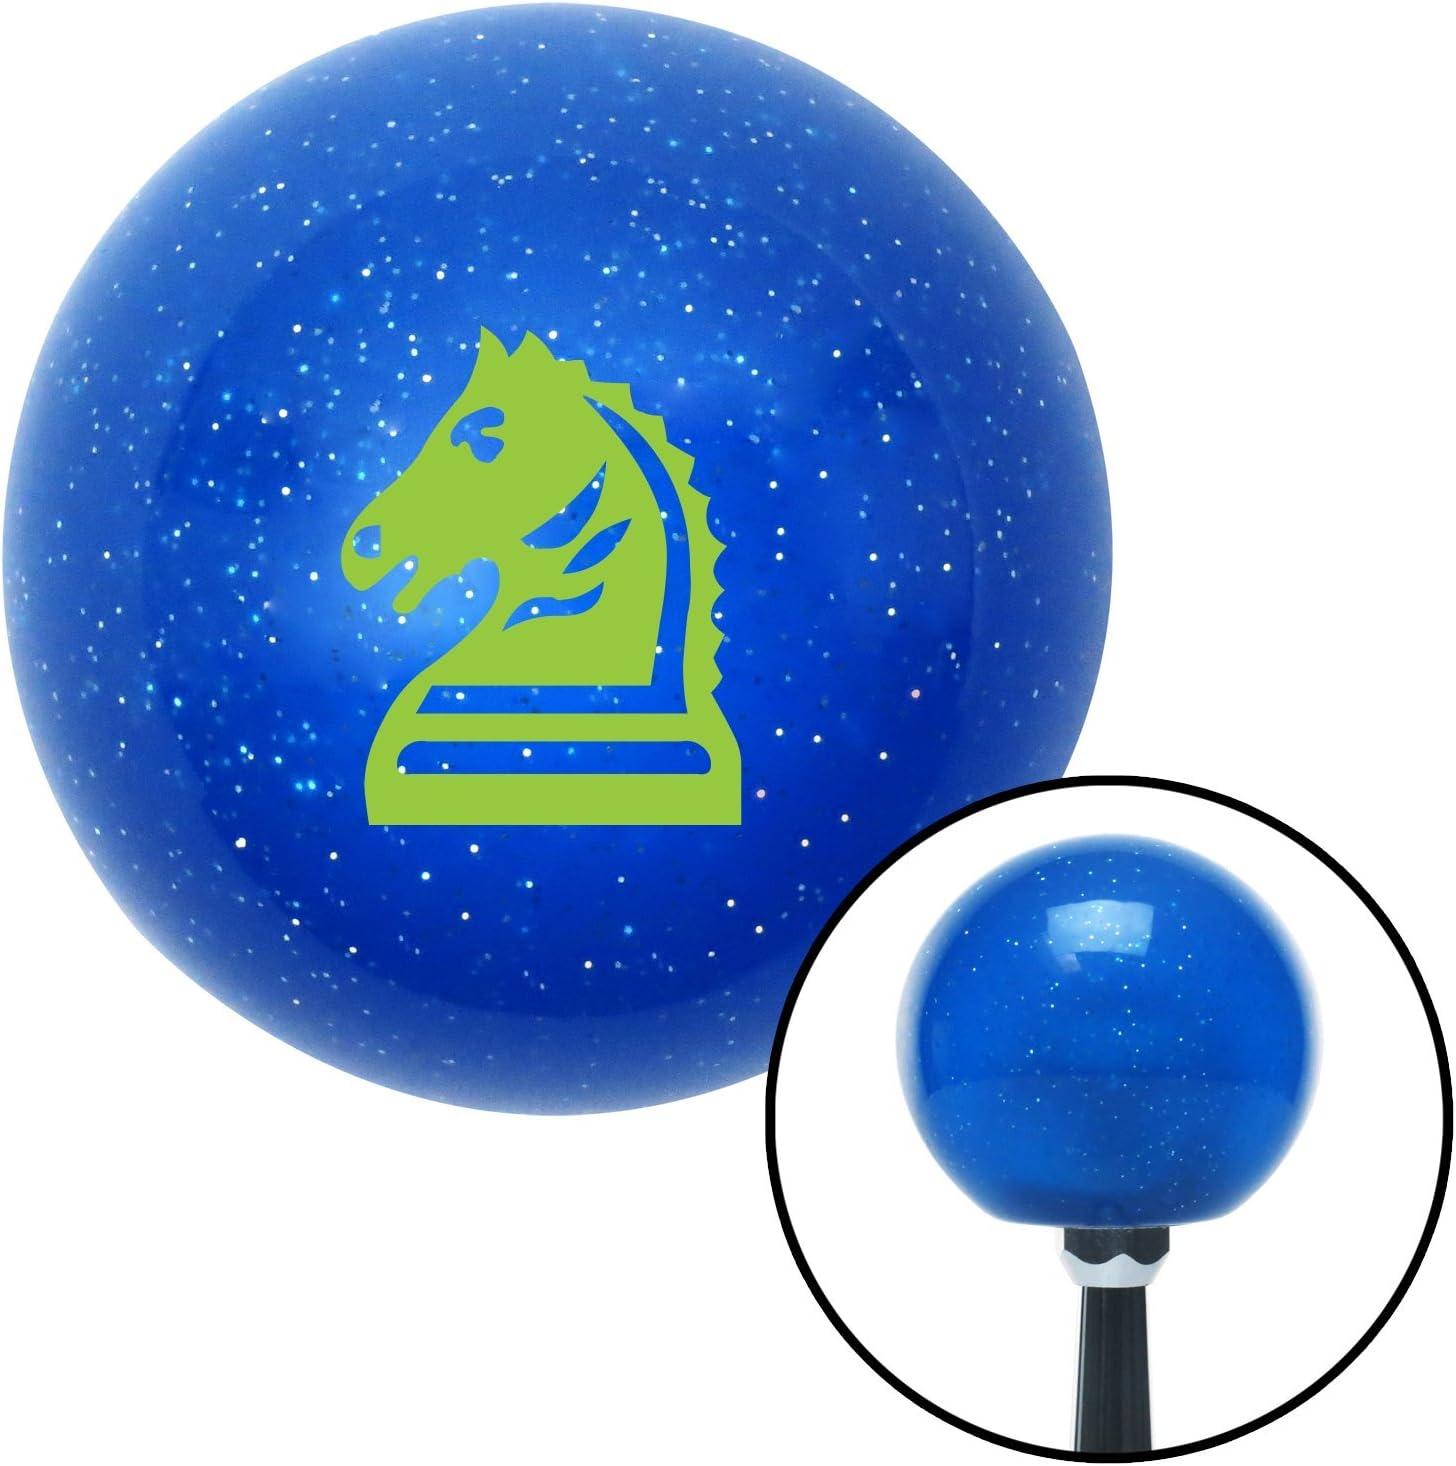 American Shifter 26843 Blue Metal Flake Shift Knob Green Knight Horse